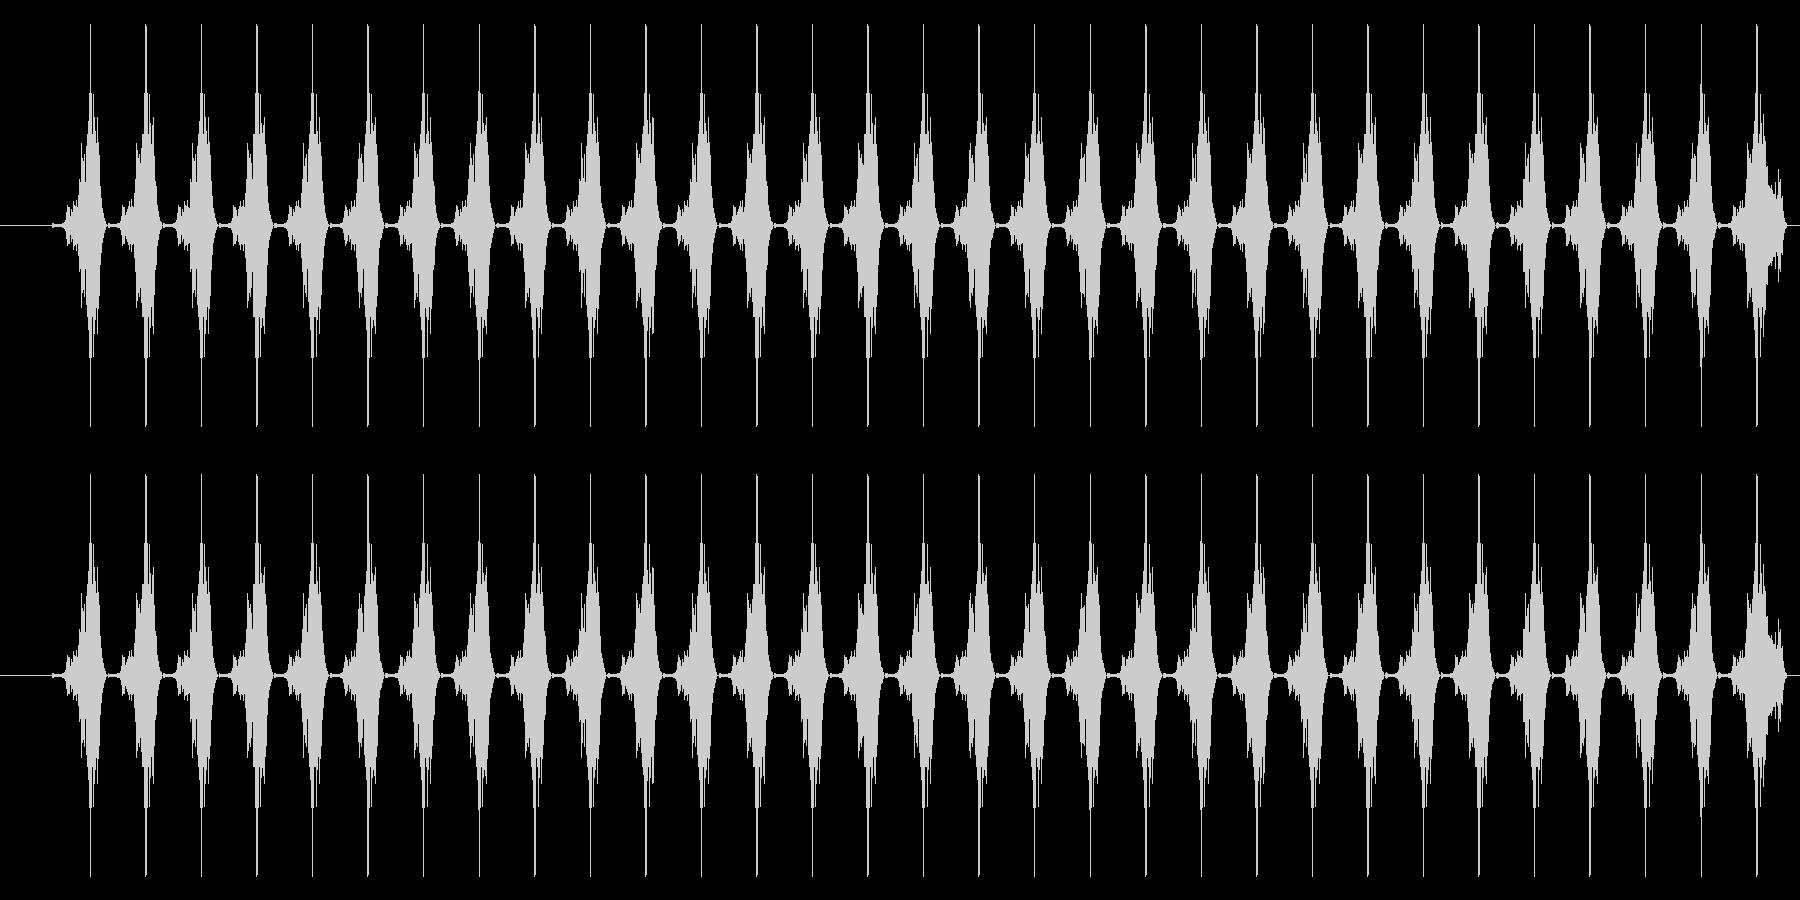 SNES-アクション01-19(メッセーの未再生の波形